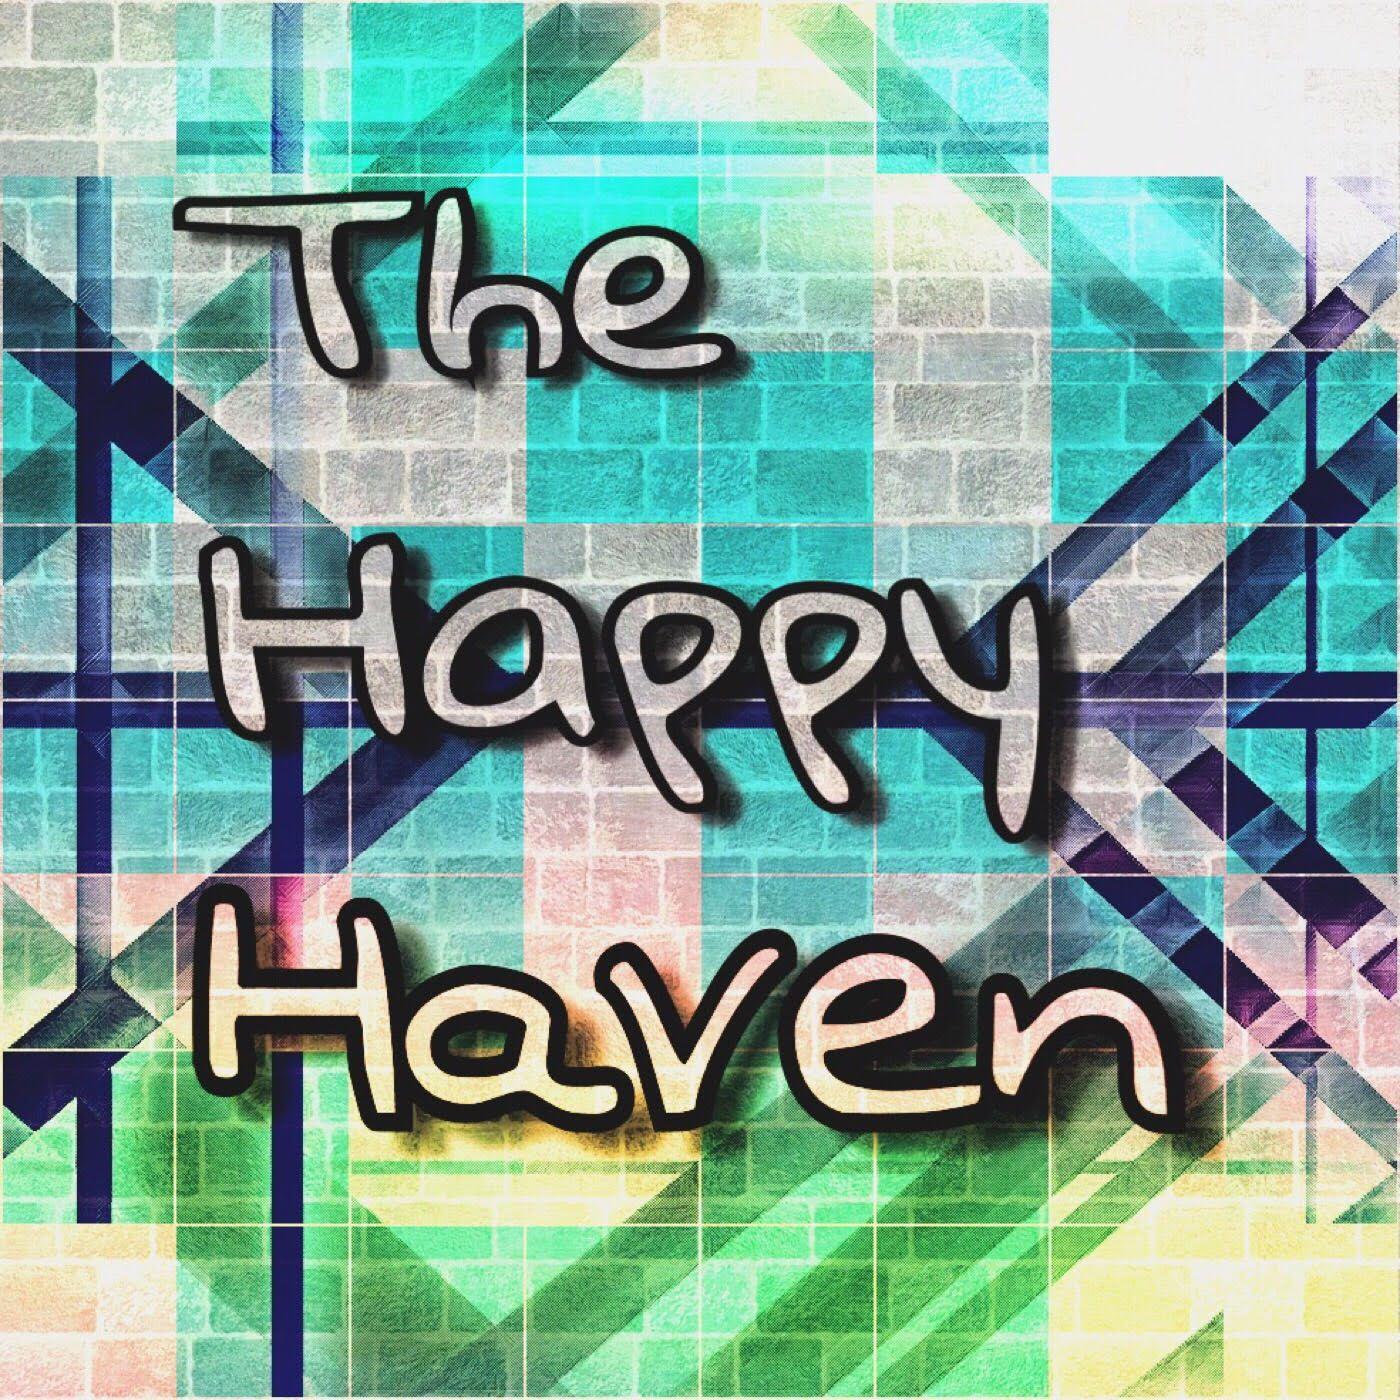 The Happy Haven